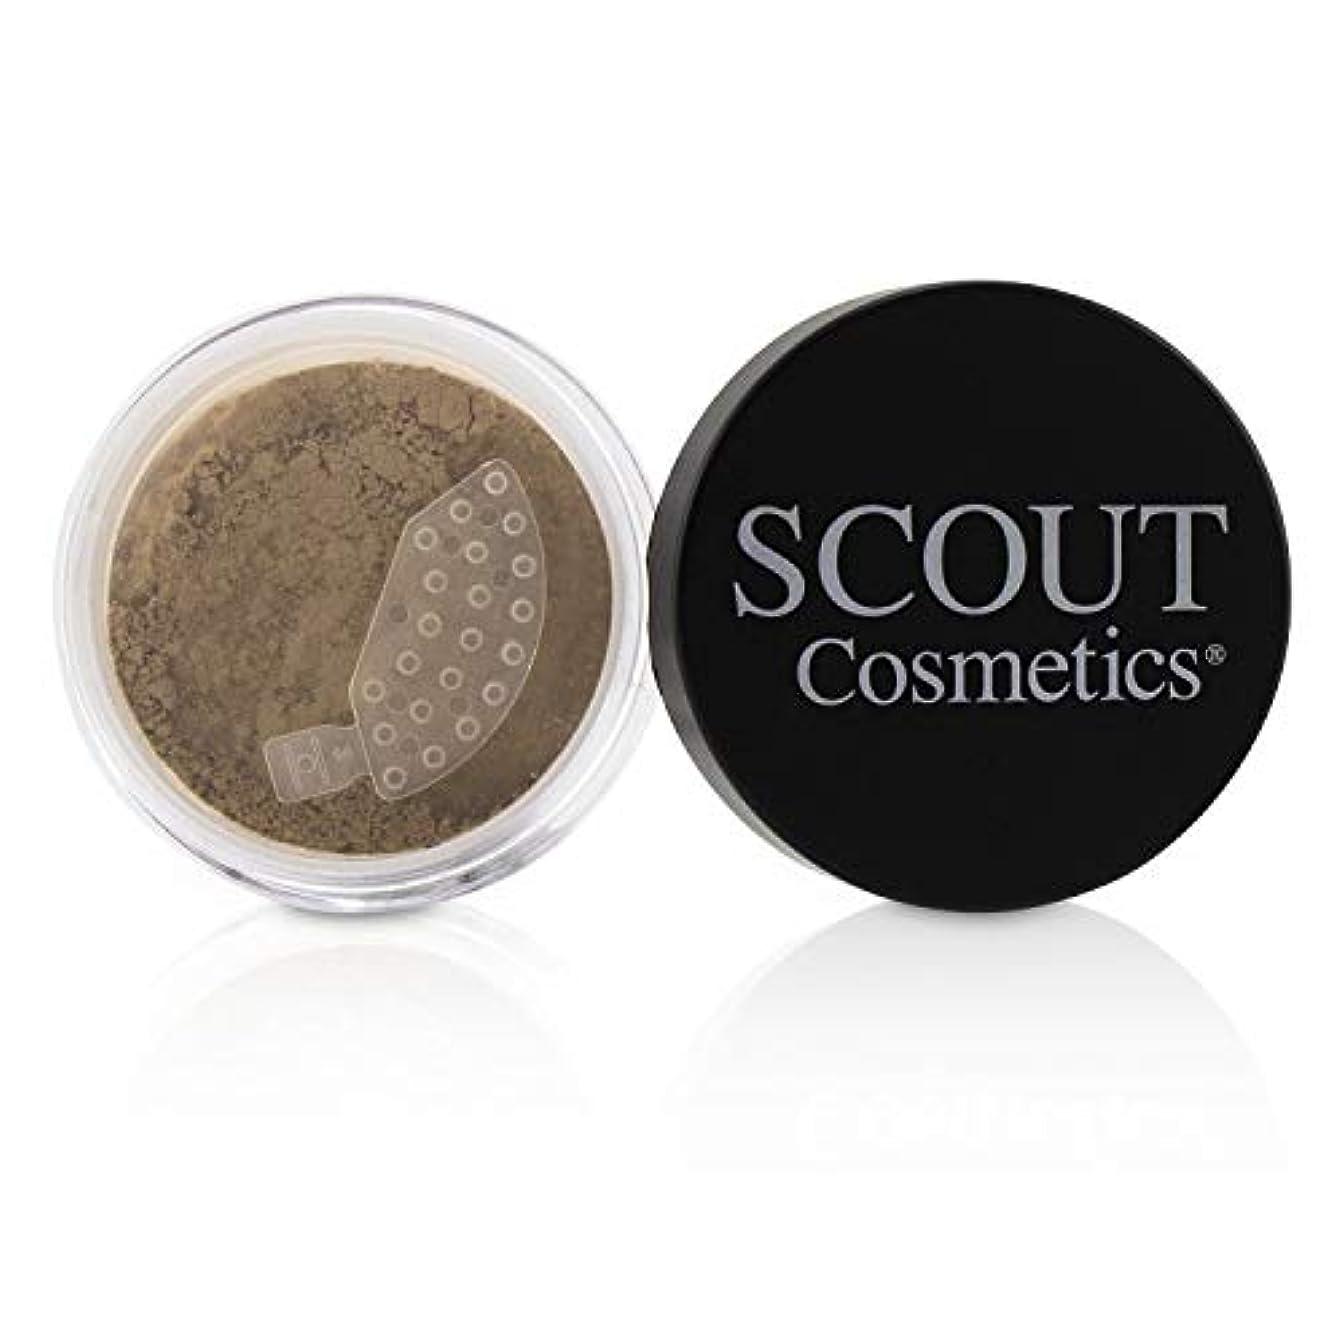 SCOUT Cosmetics Mineral Powder Foundation SPF 20 - # Sunset 8g/0.28oz並行輸入品